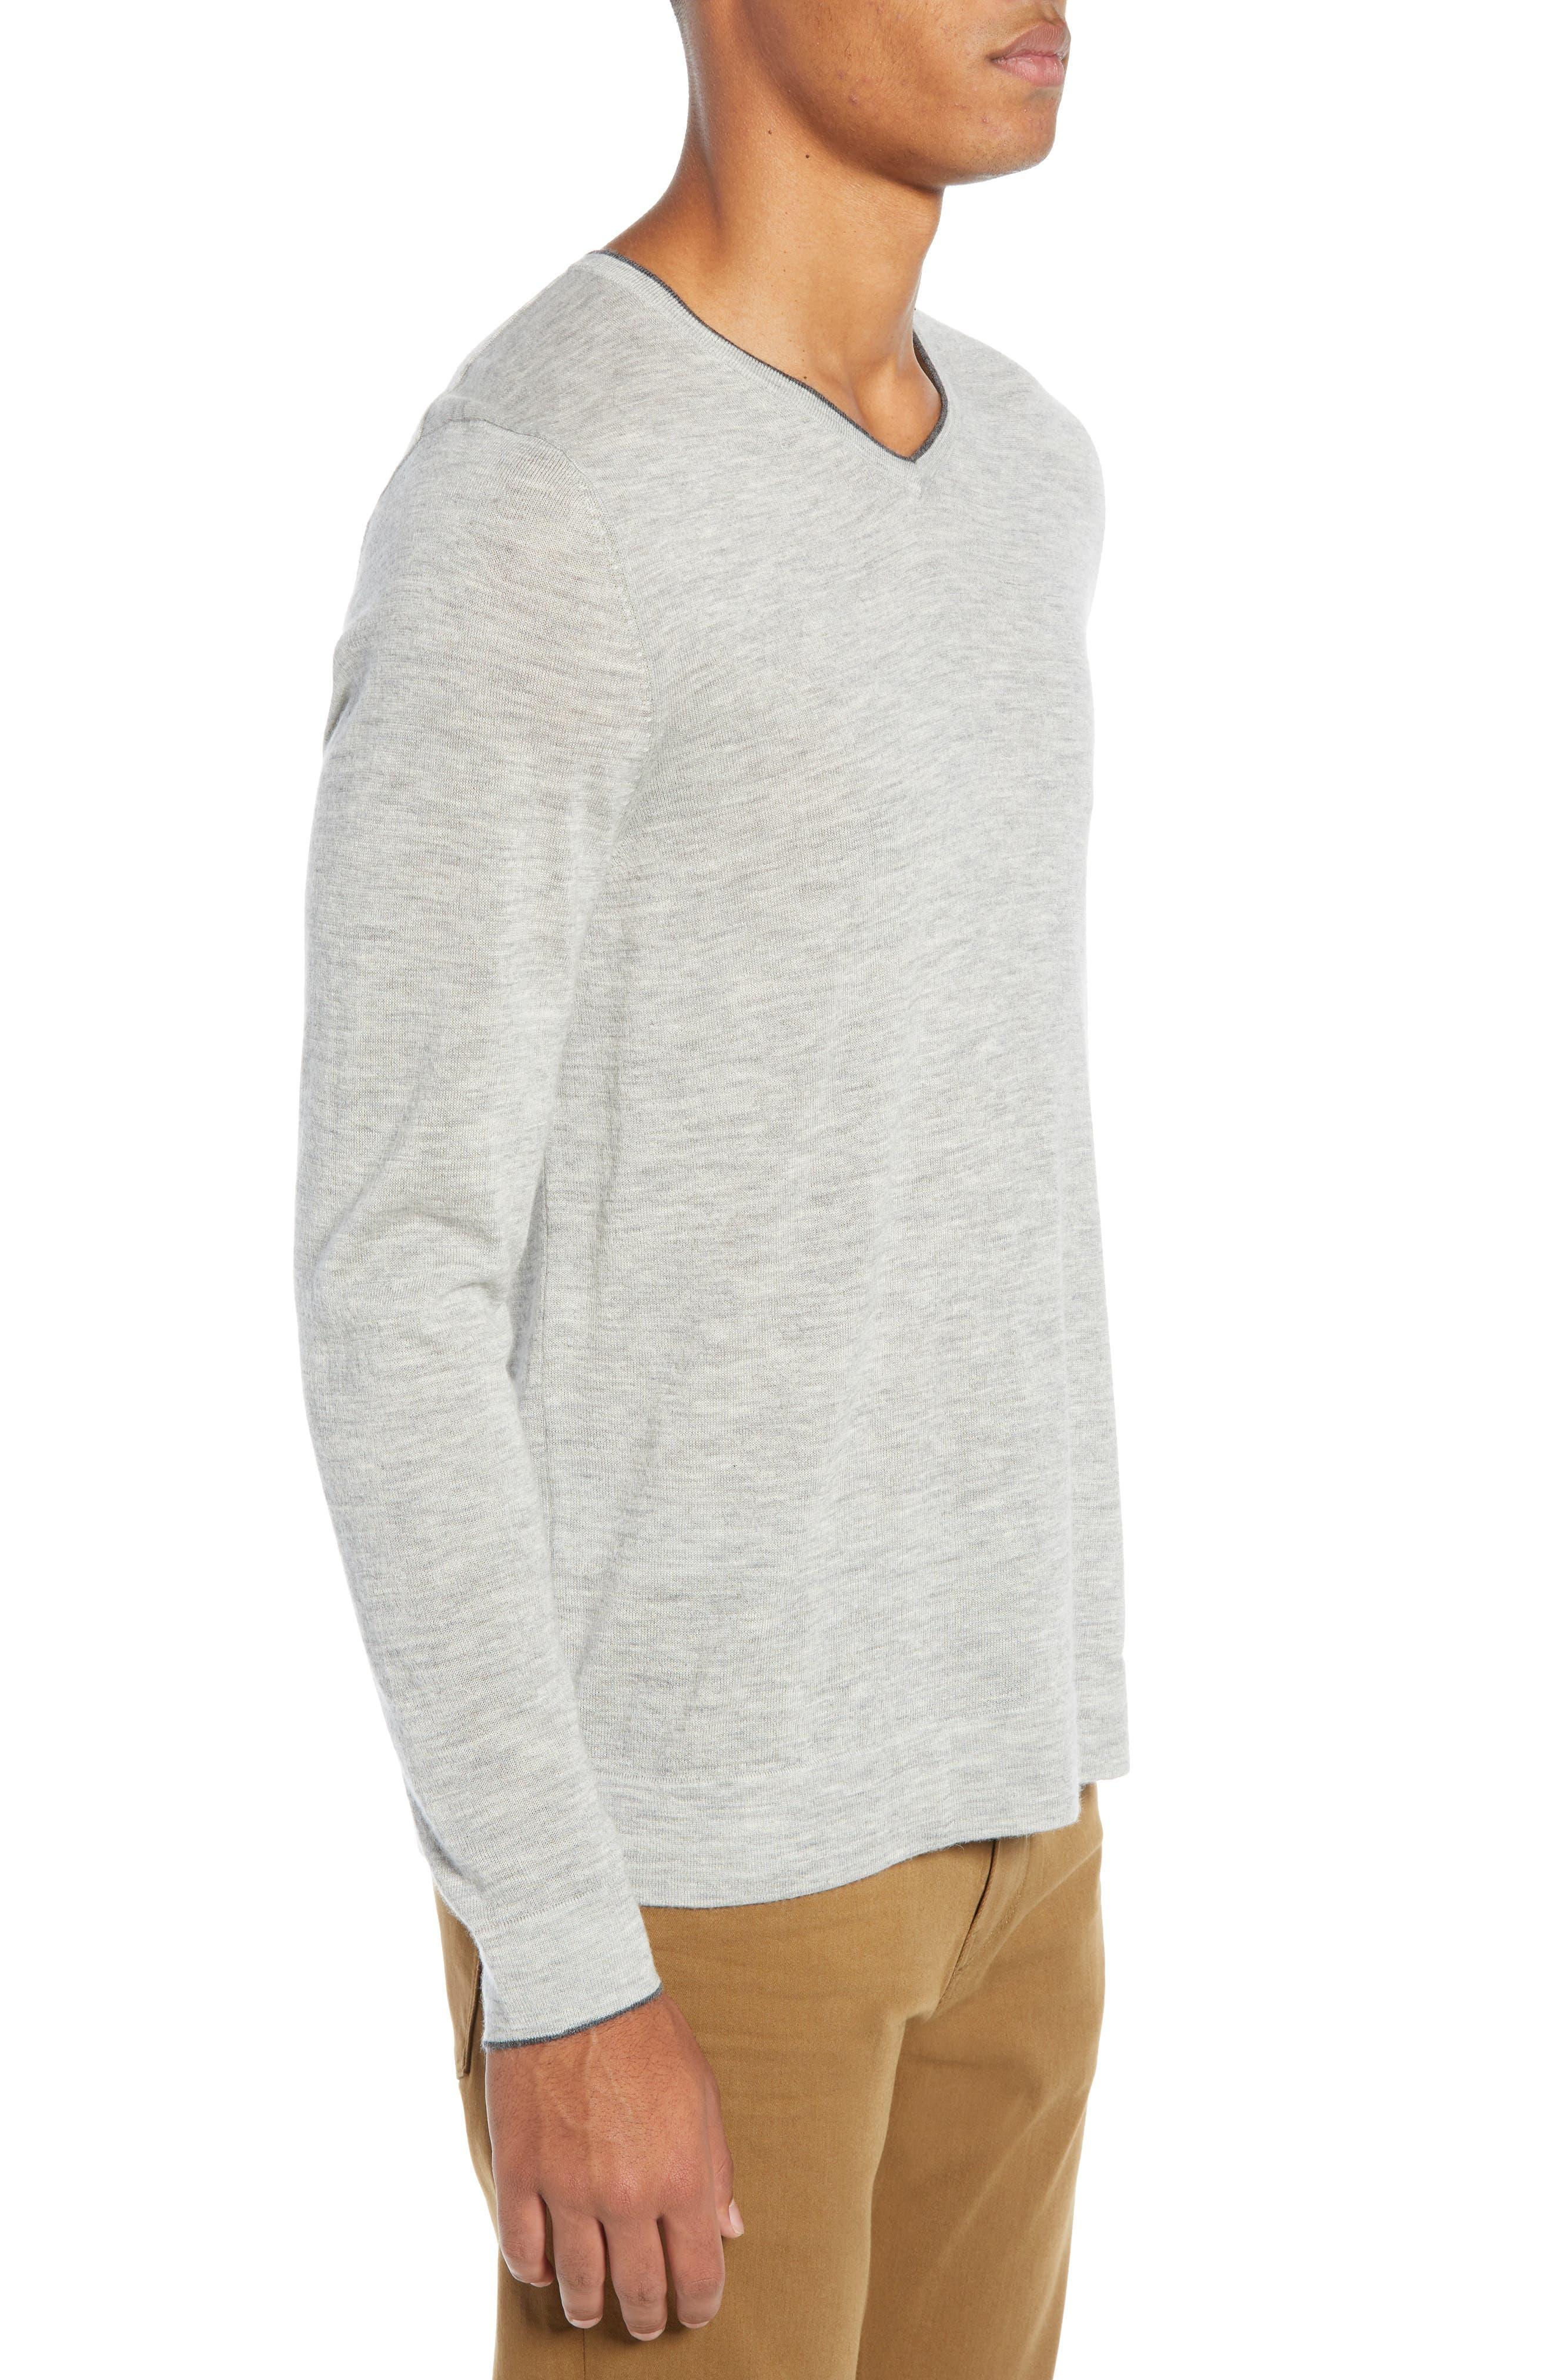 NORDSTROM SIGNATURE,                             Cashmere V-Neck Sweater,                             Alternate thumbnail 3, color,                             050